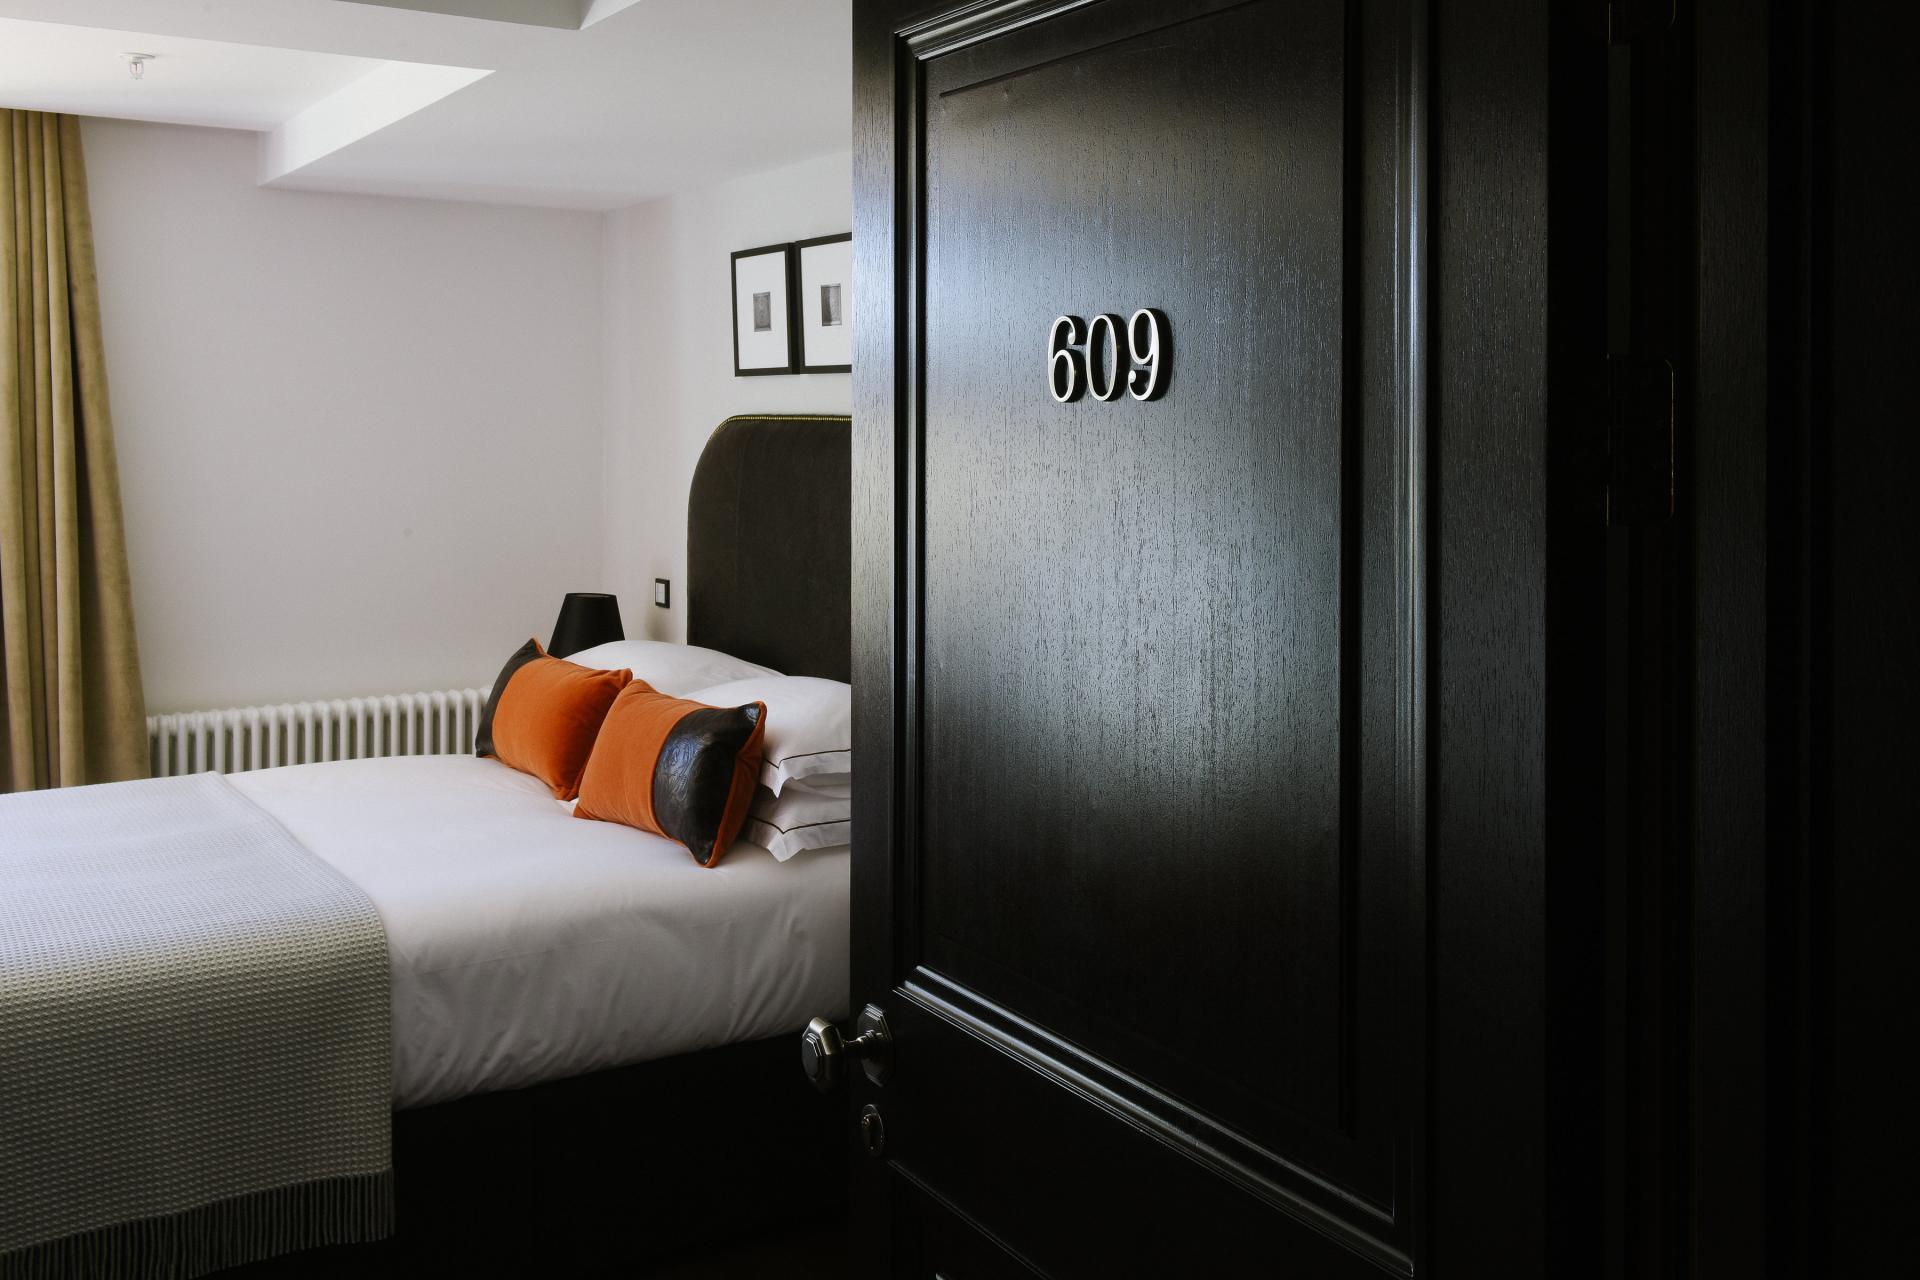 Bedroom at The Edinburgh Grand Apartments, Centre, Edinburgh - Citybase Apartments